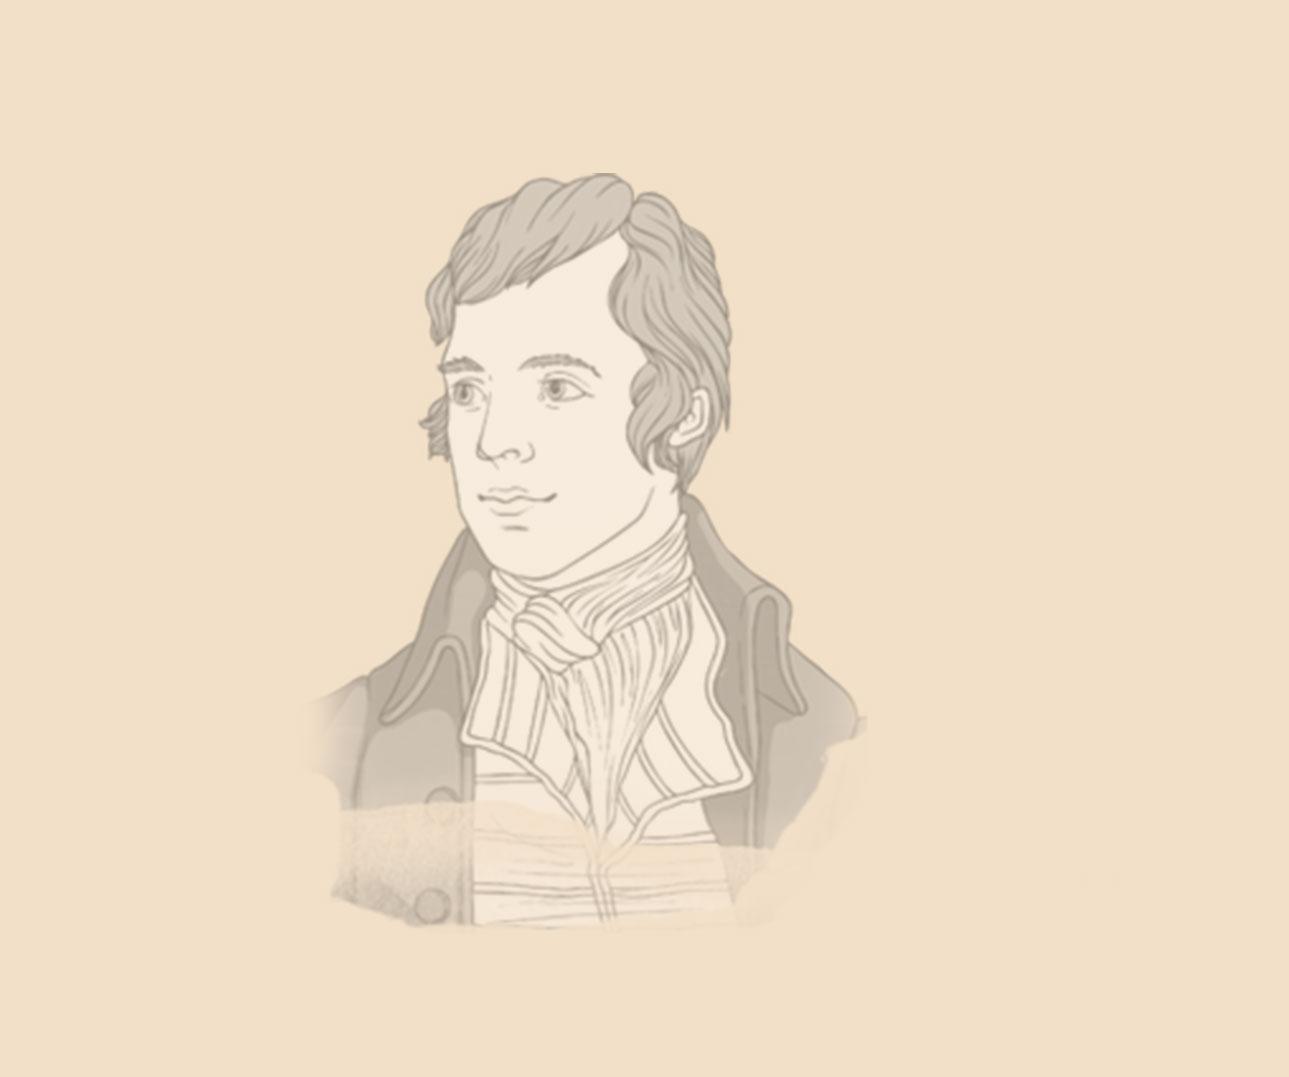 Robert Burns drawn portrait on paper faded